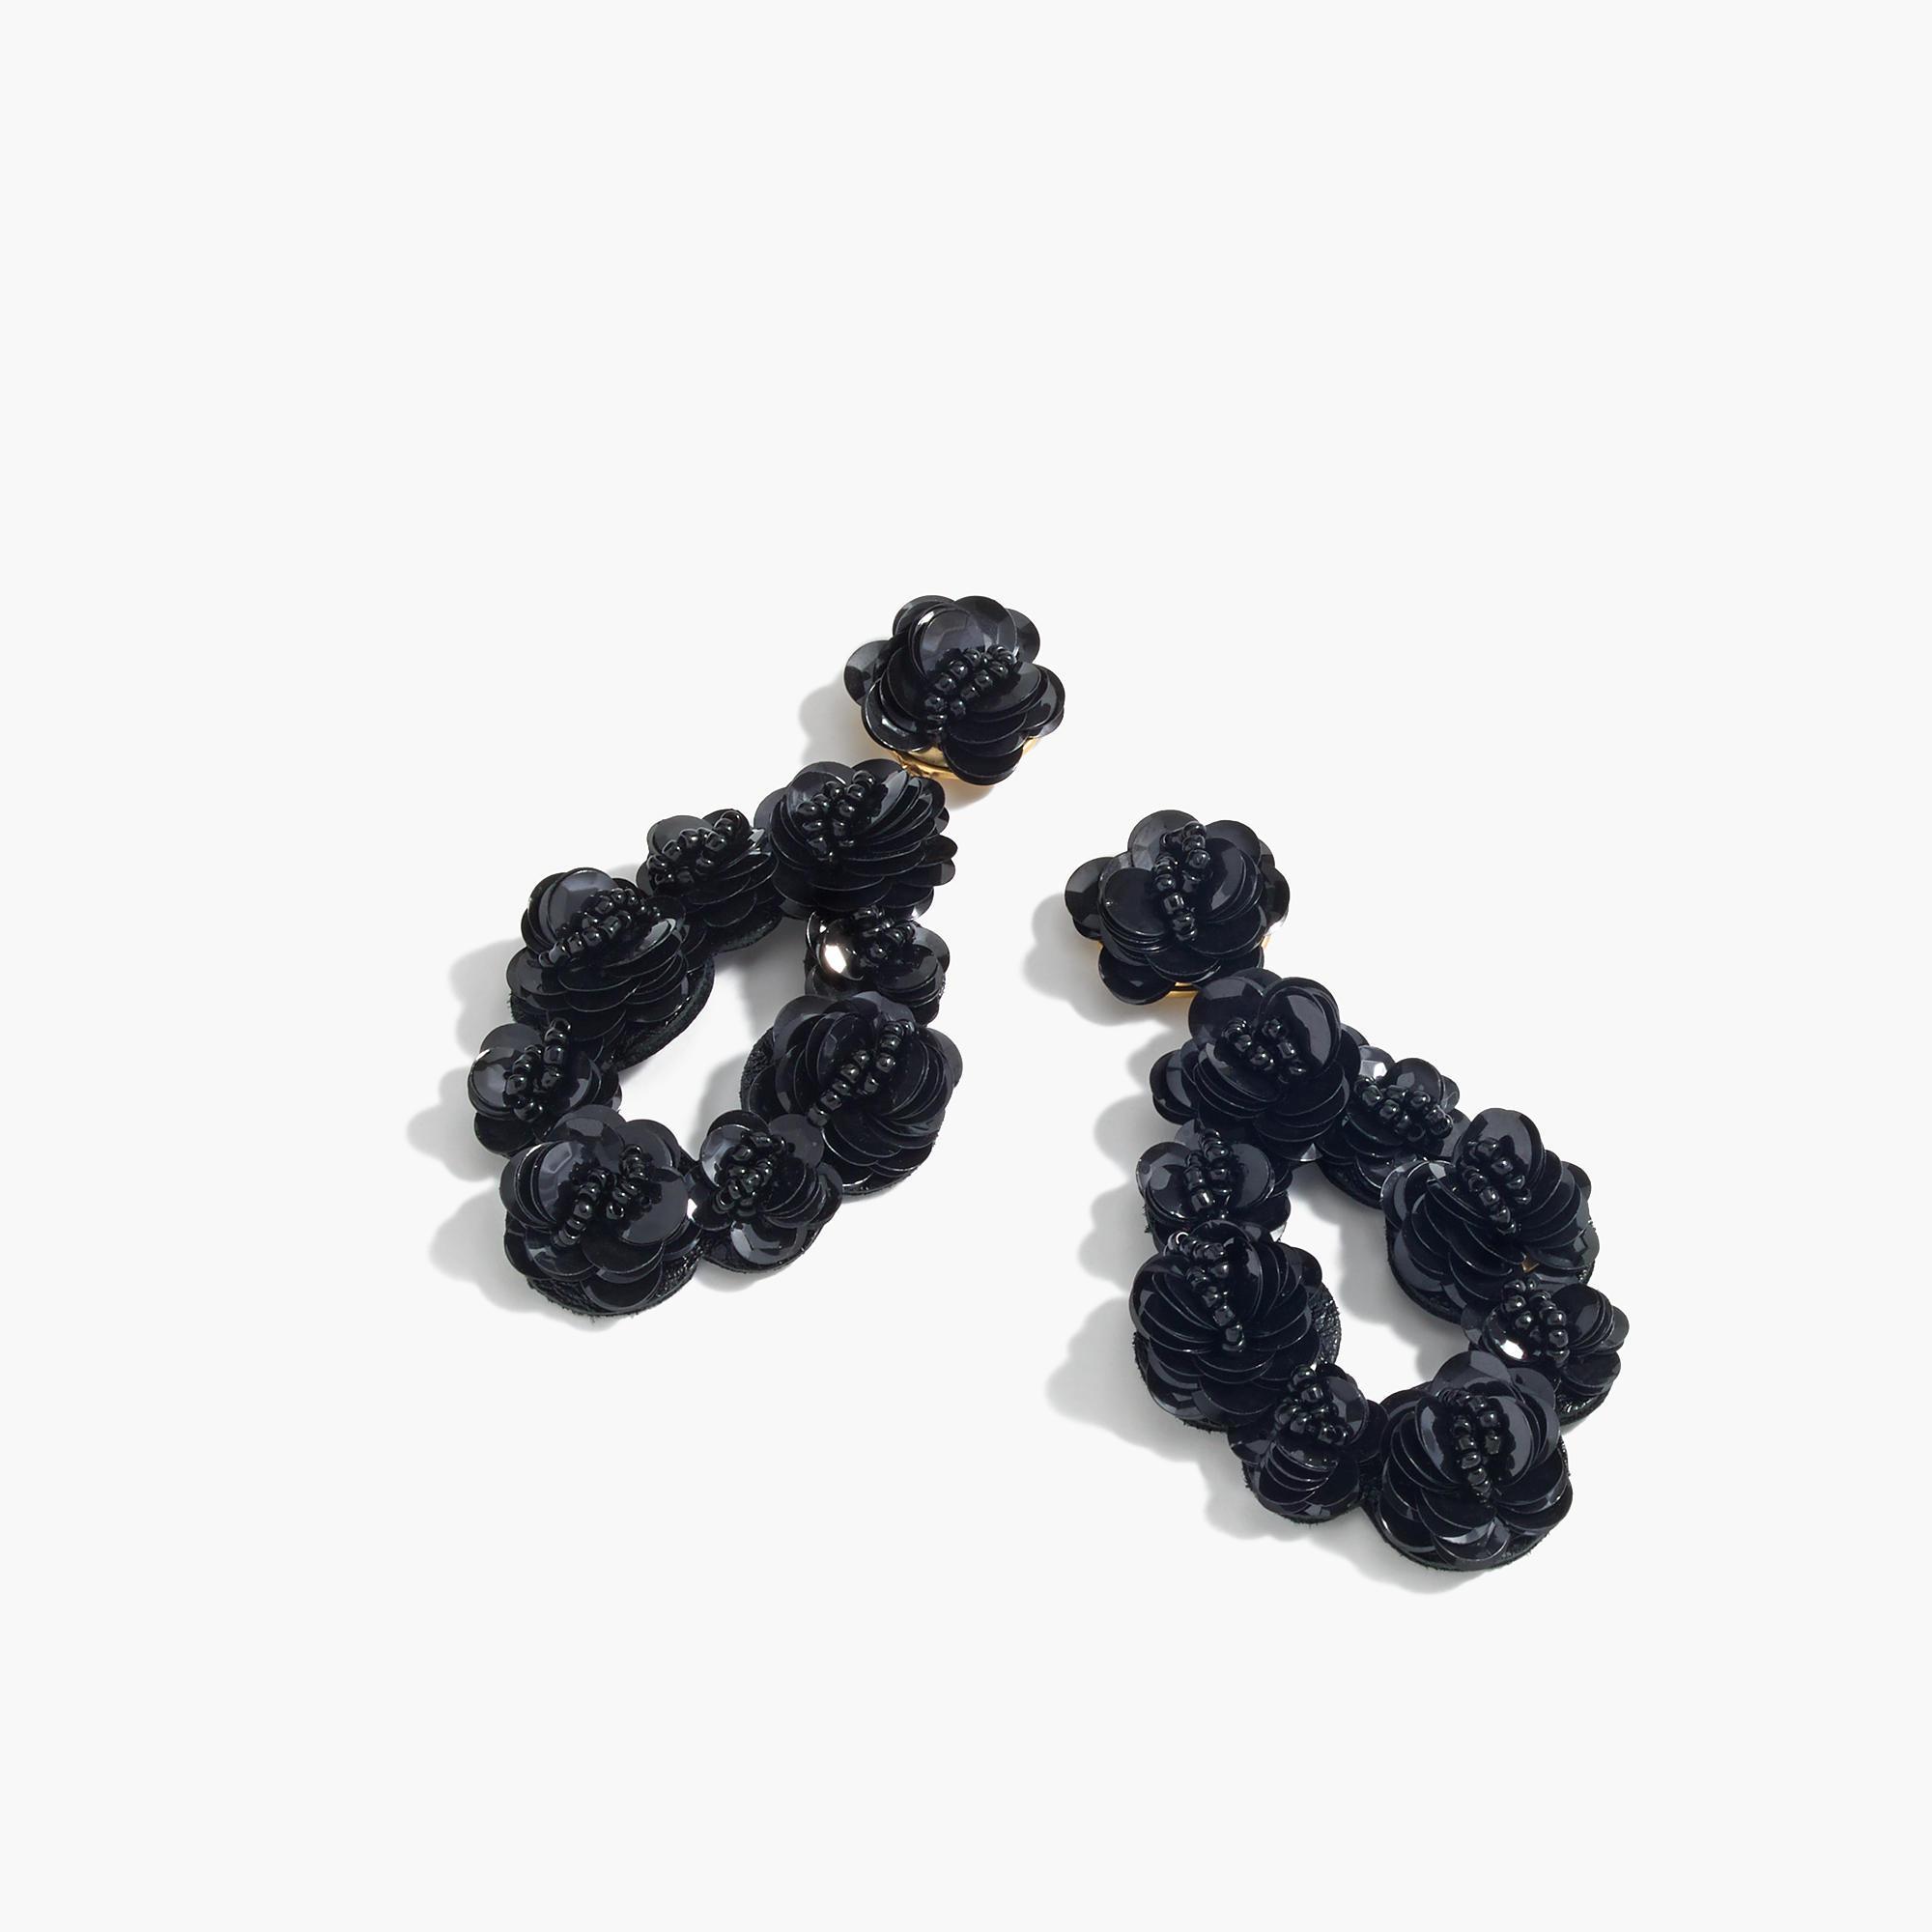 7d67c90bea3 Lyst - J.Crew Leather-backed Sequin Petal Earrings in Black